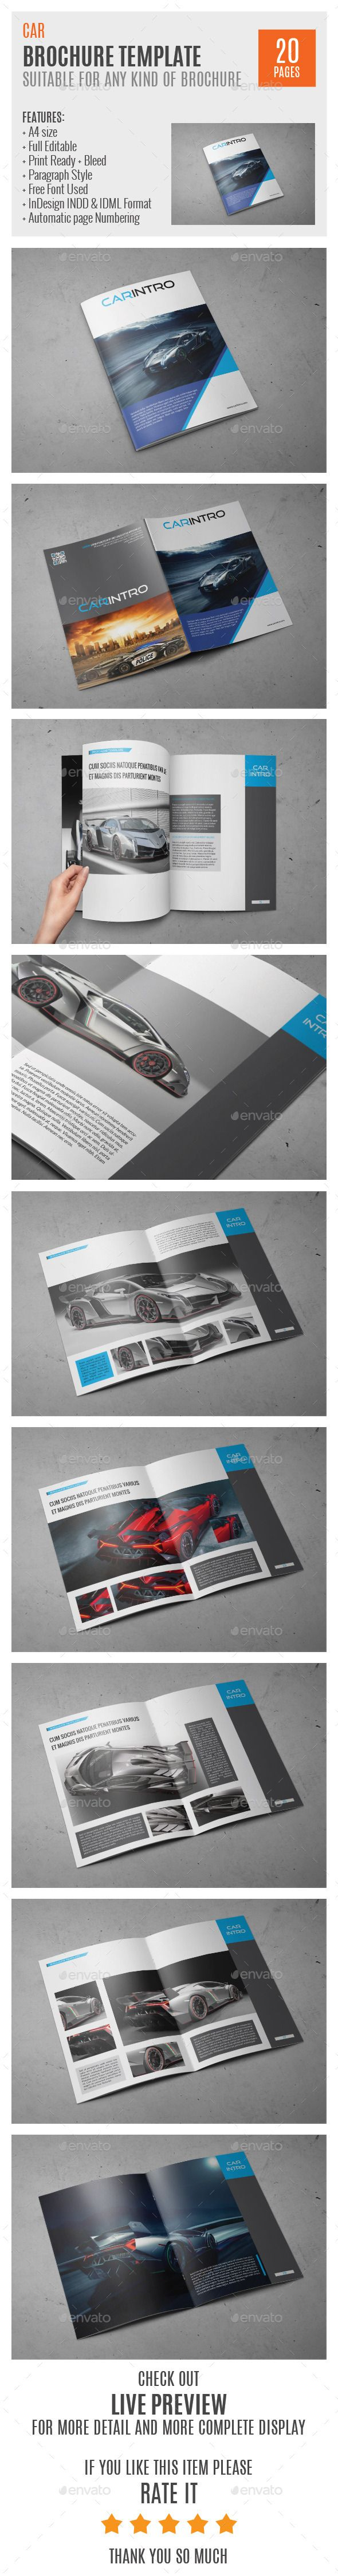 Car A4 Indesign Brochure Template #design Download: http://graphicriver.net/item/car-a4-indesign-brochure-template-0036/10281883?ref=ksioks